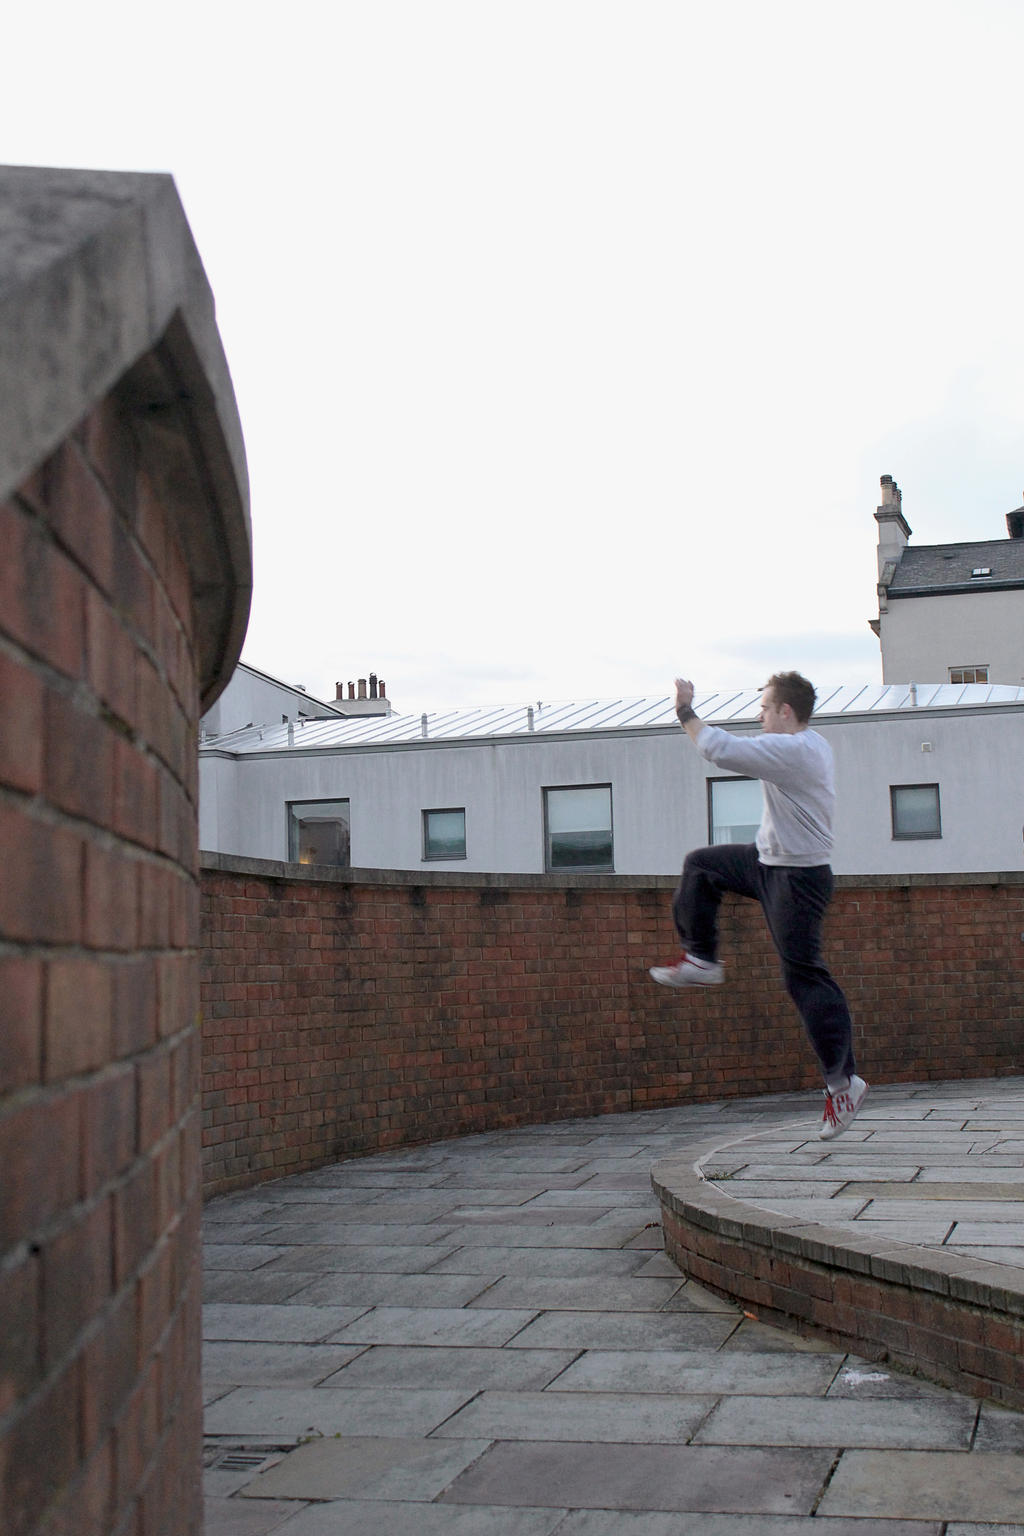 James - Running Catleap II by Zade-uk